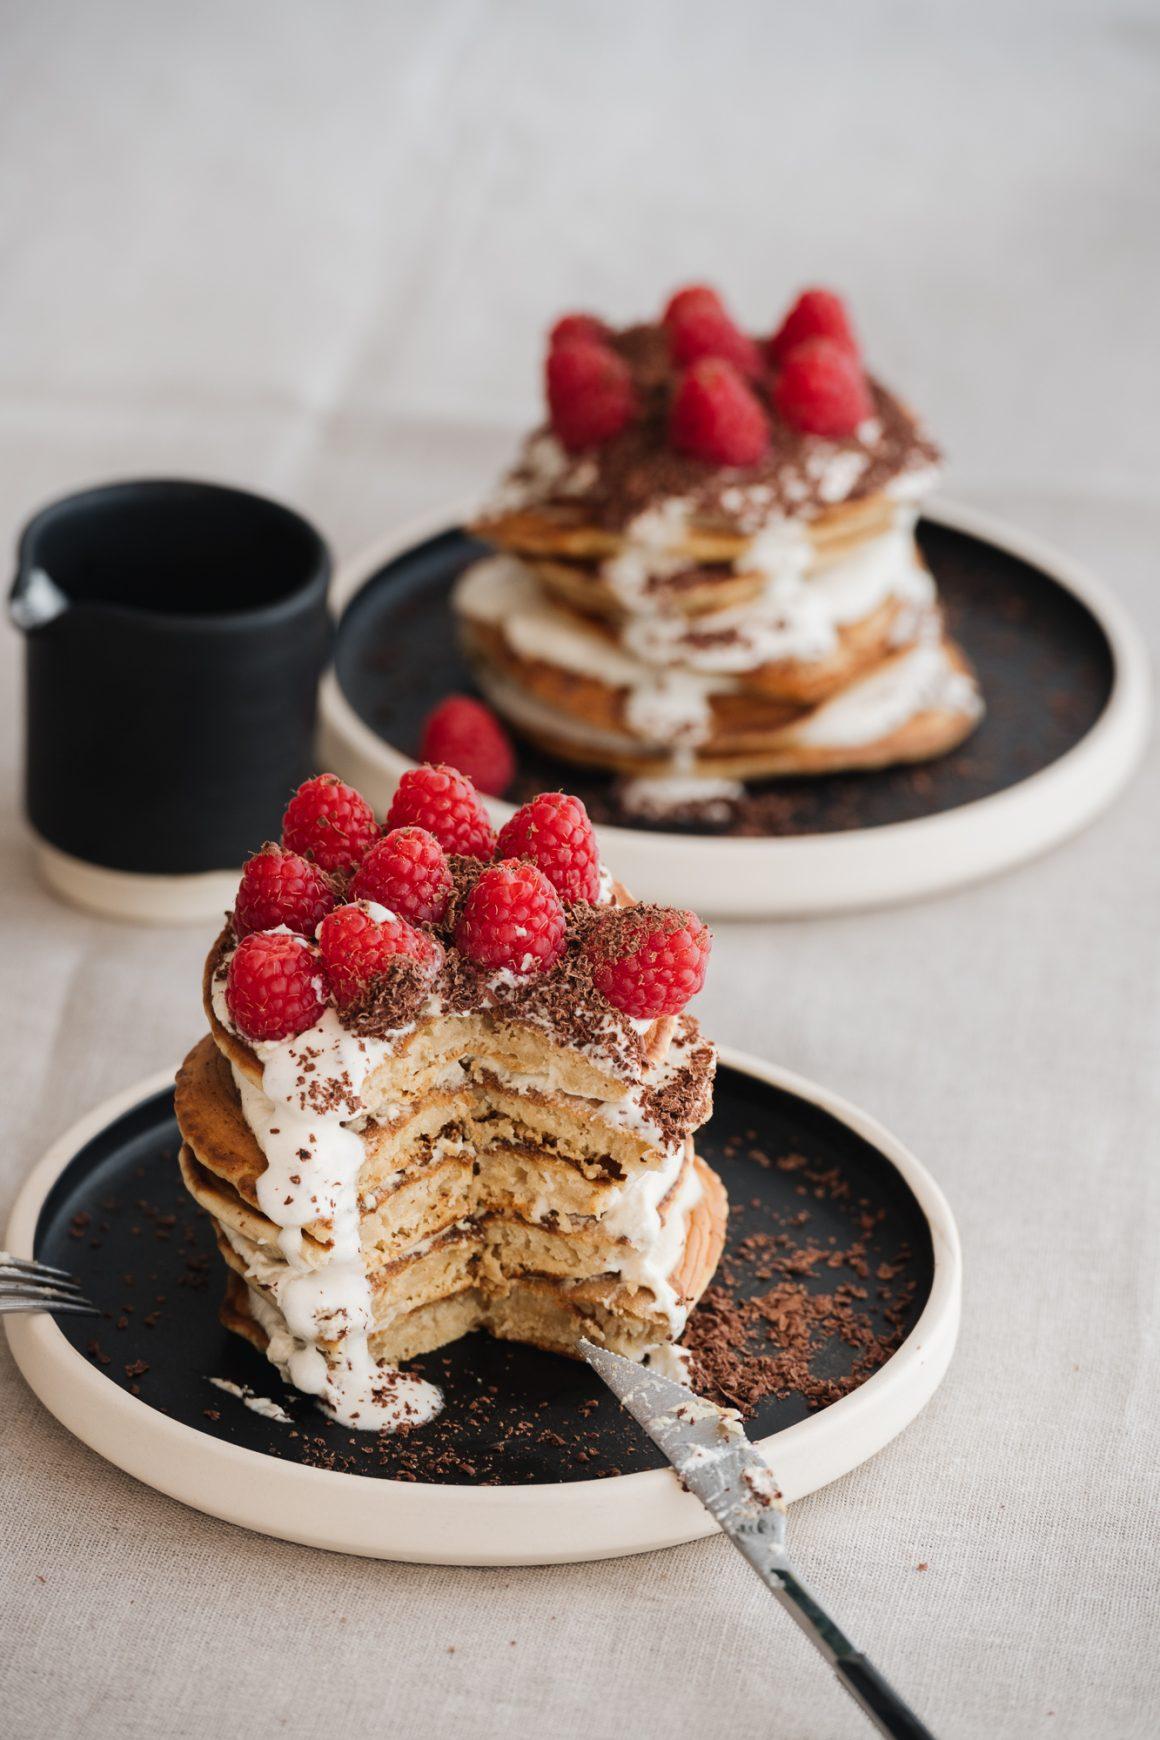 dsc 4887 2 1160x1740 - Gluten Free Fluffy Pancakes